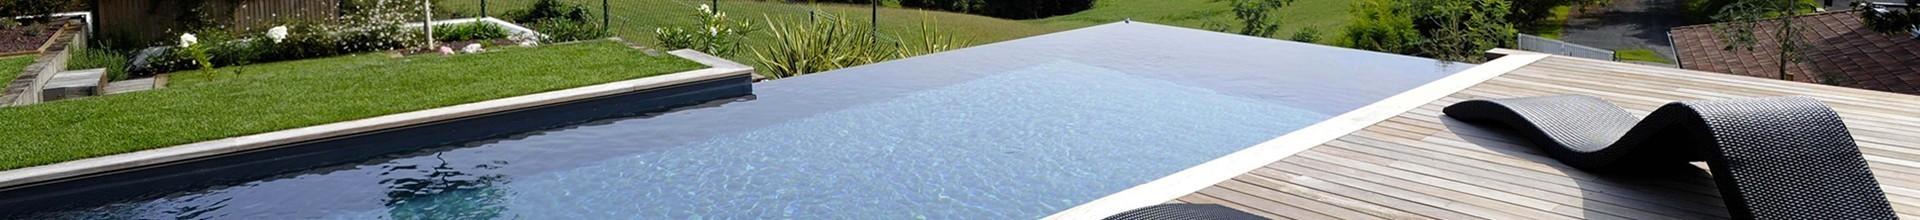 Direct usine, piscine coque prix Corrèze